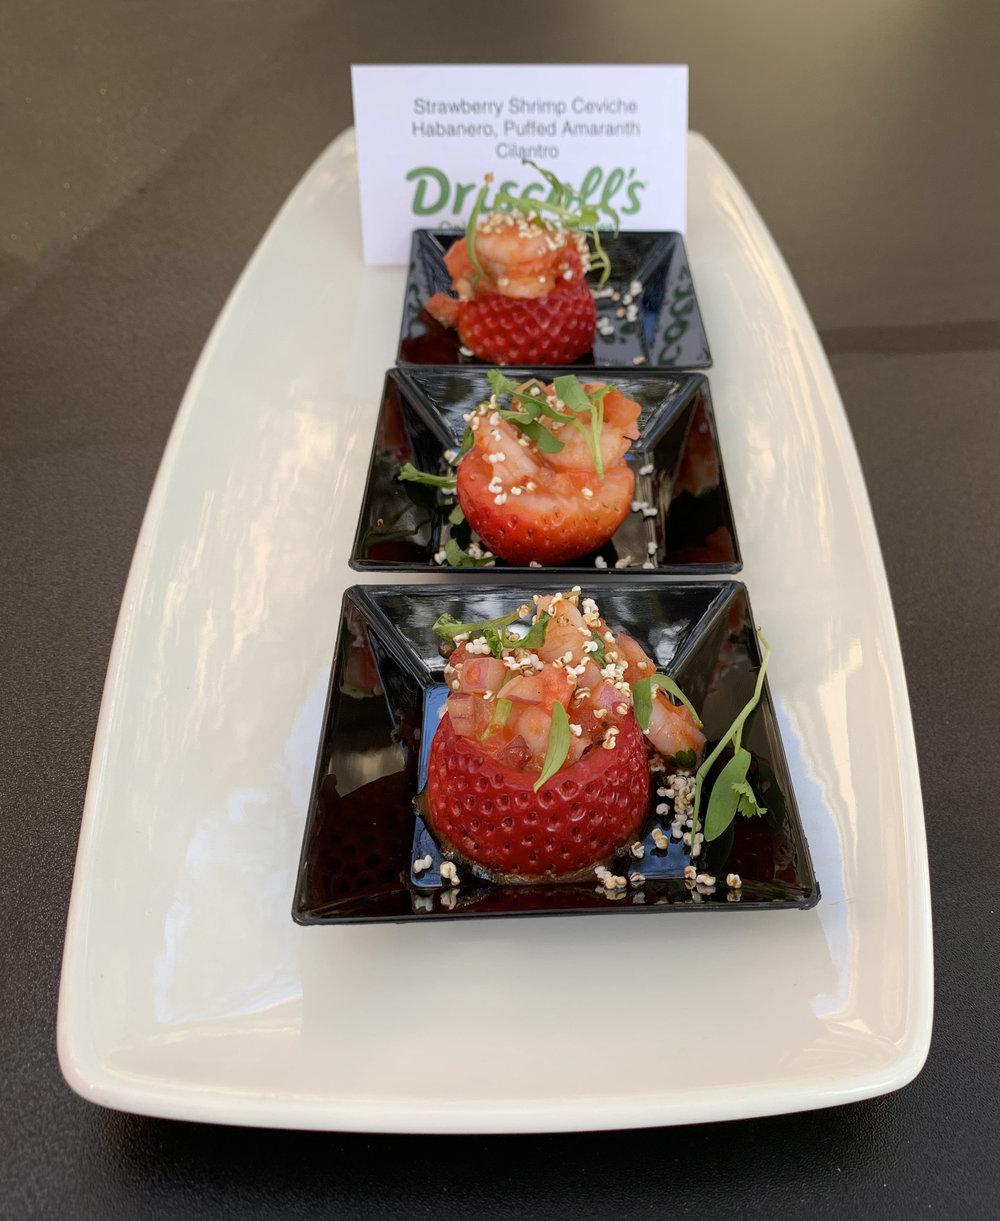 Strawberry Shrimp Ceviche, Habanero, Puffed Amaranth, Cilantro